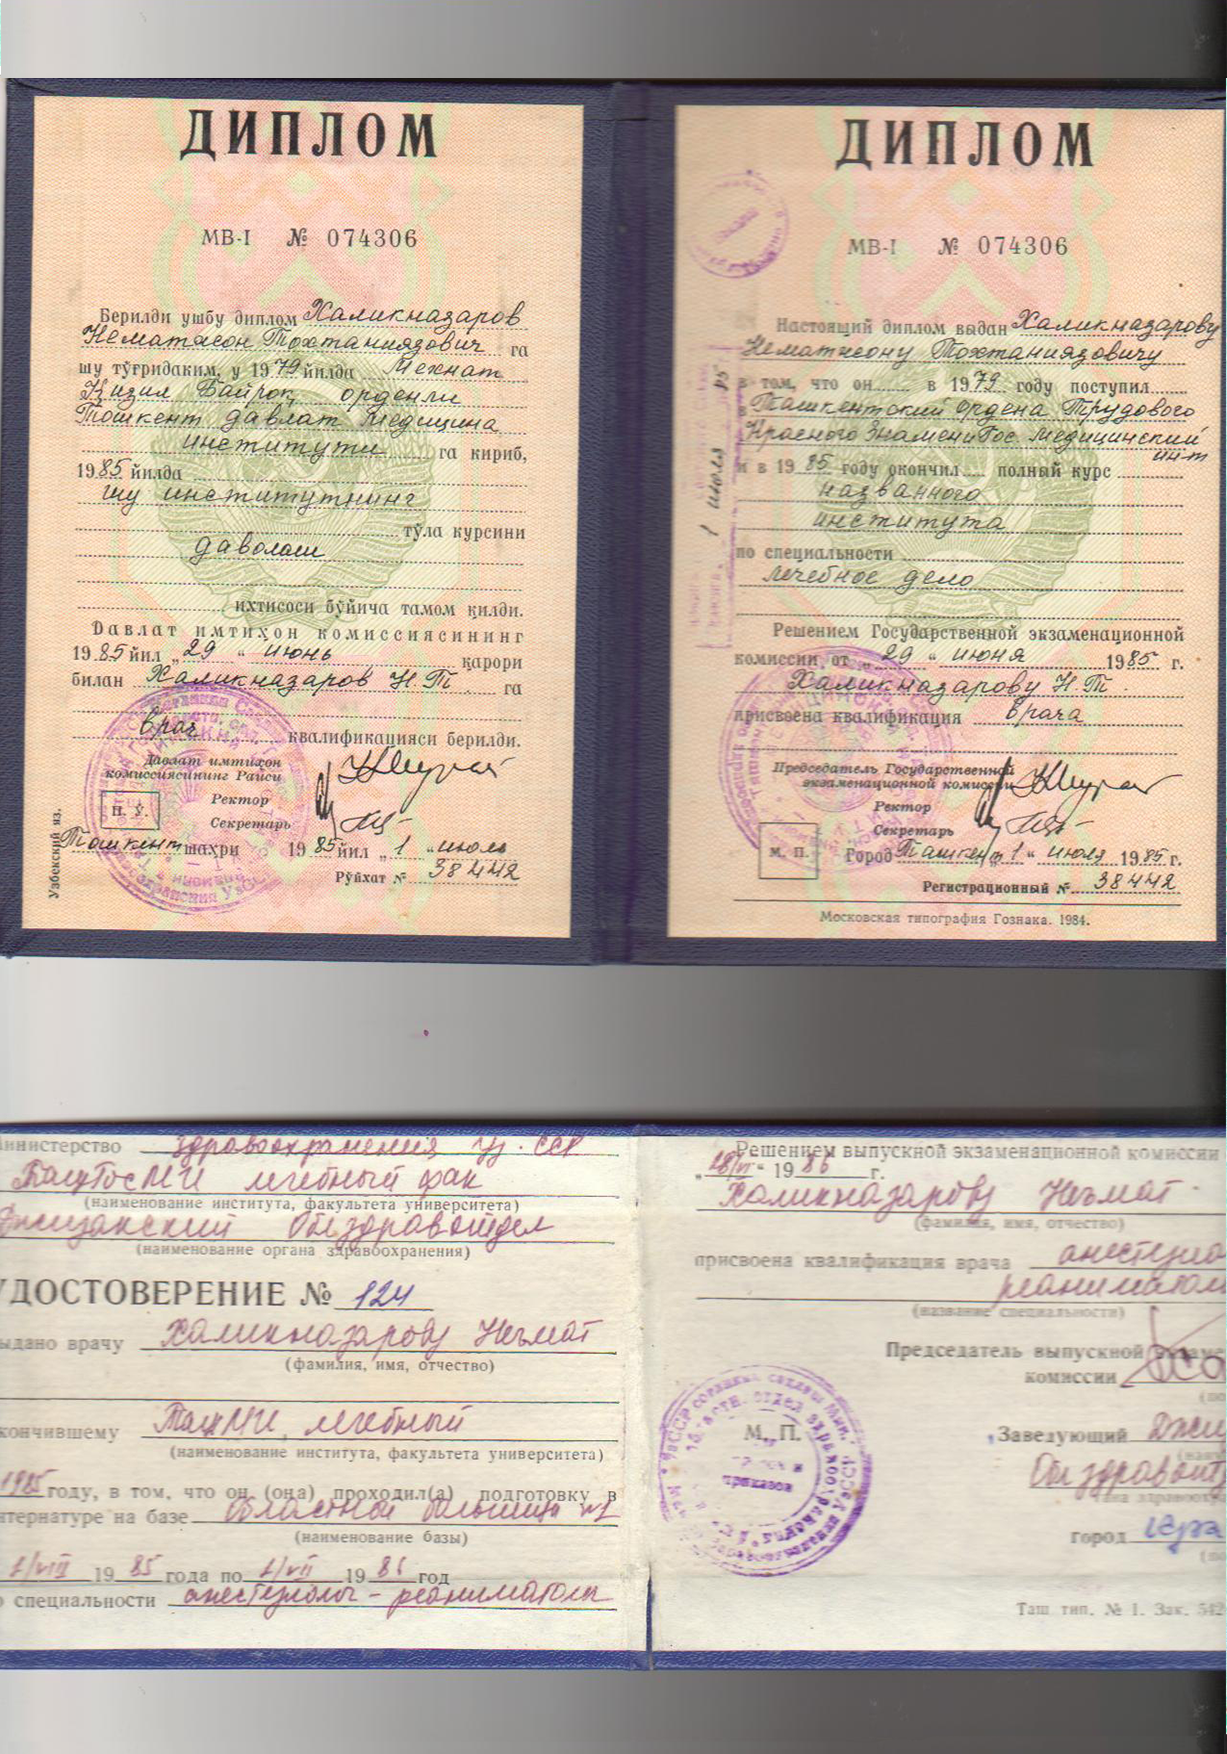 Диплом реаниматолог клиники Akniet Shipa айрамский р-н. с. Карабулак